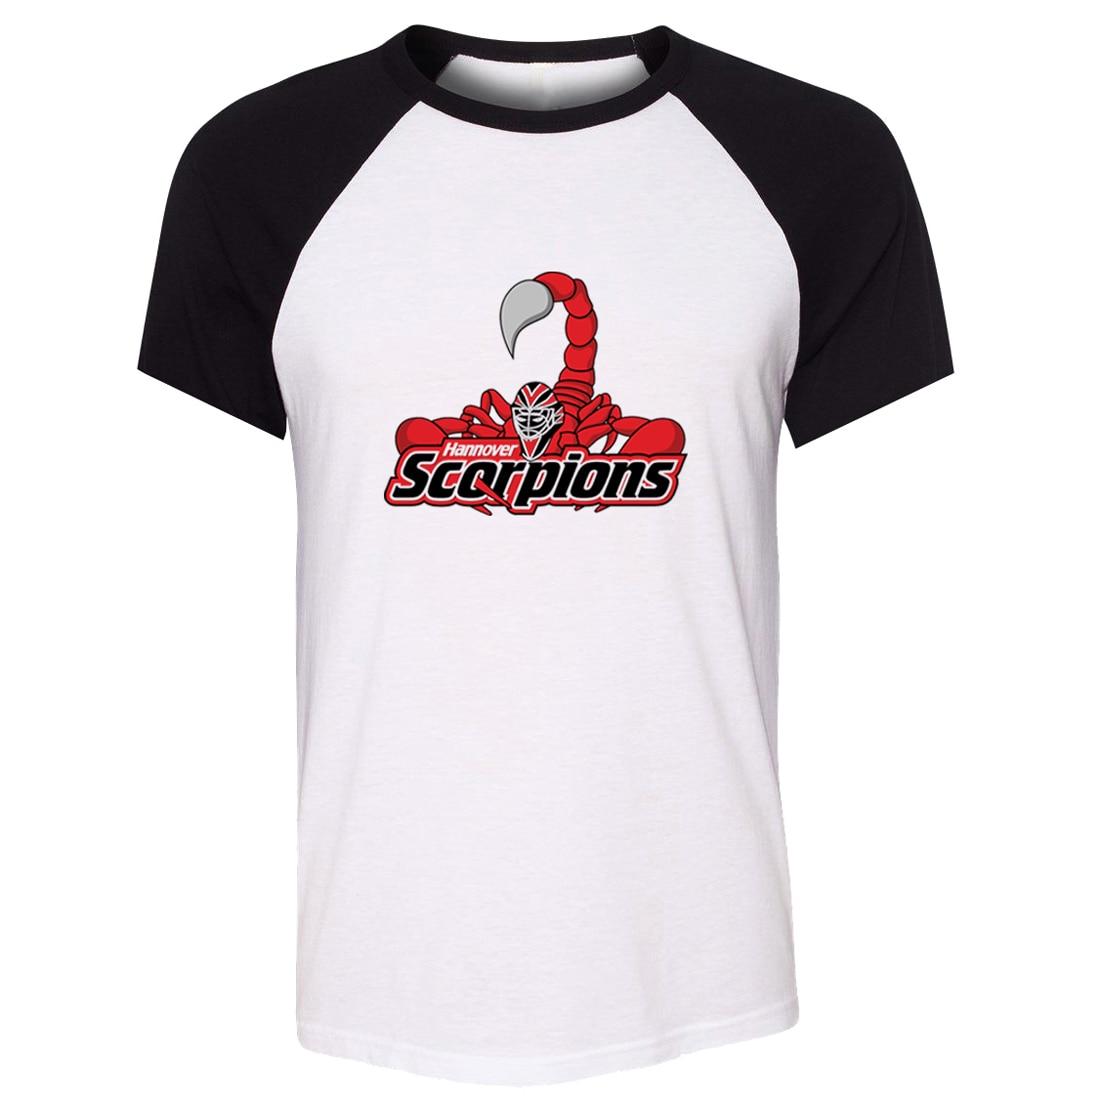 Scorpions Mens Rock Band T-Shirt